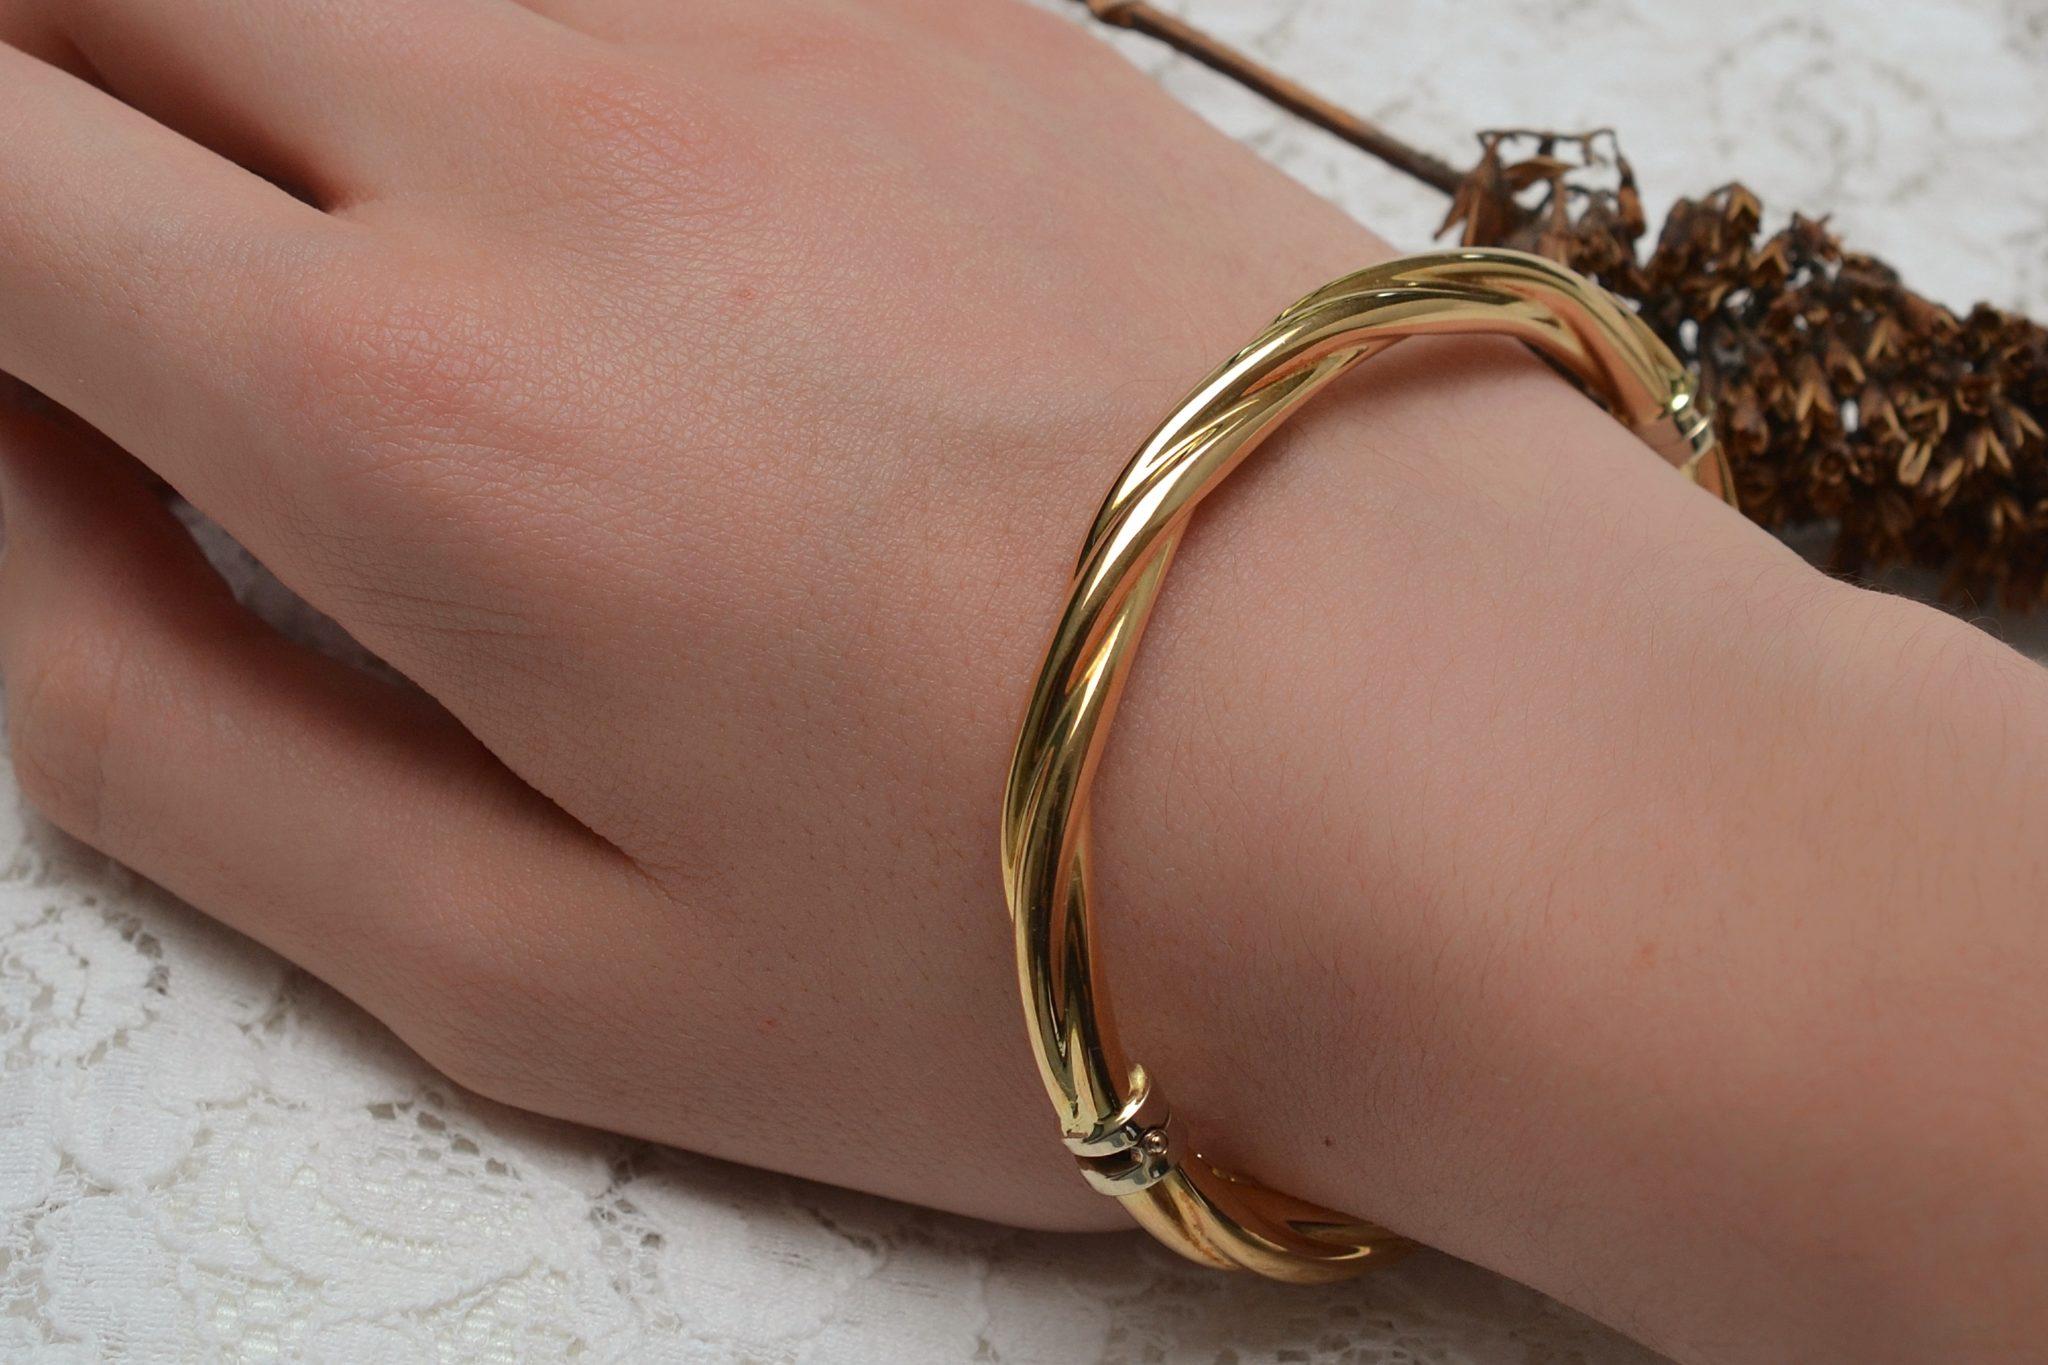 Bracelet torsadé en Or jaune - bijou rétro